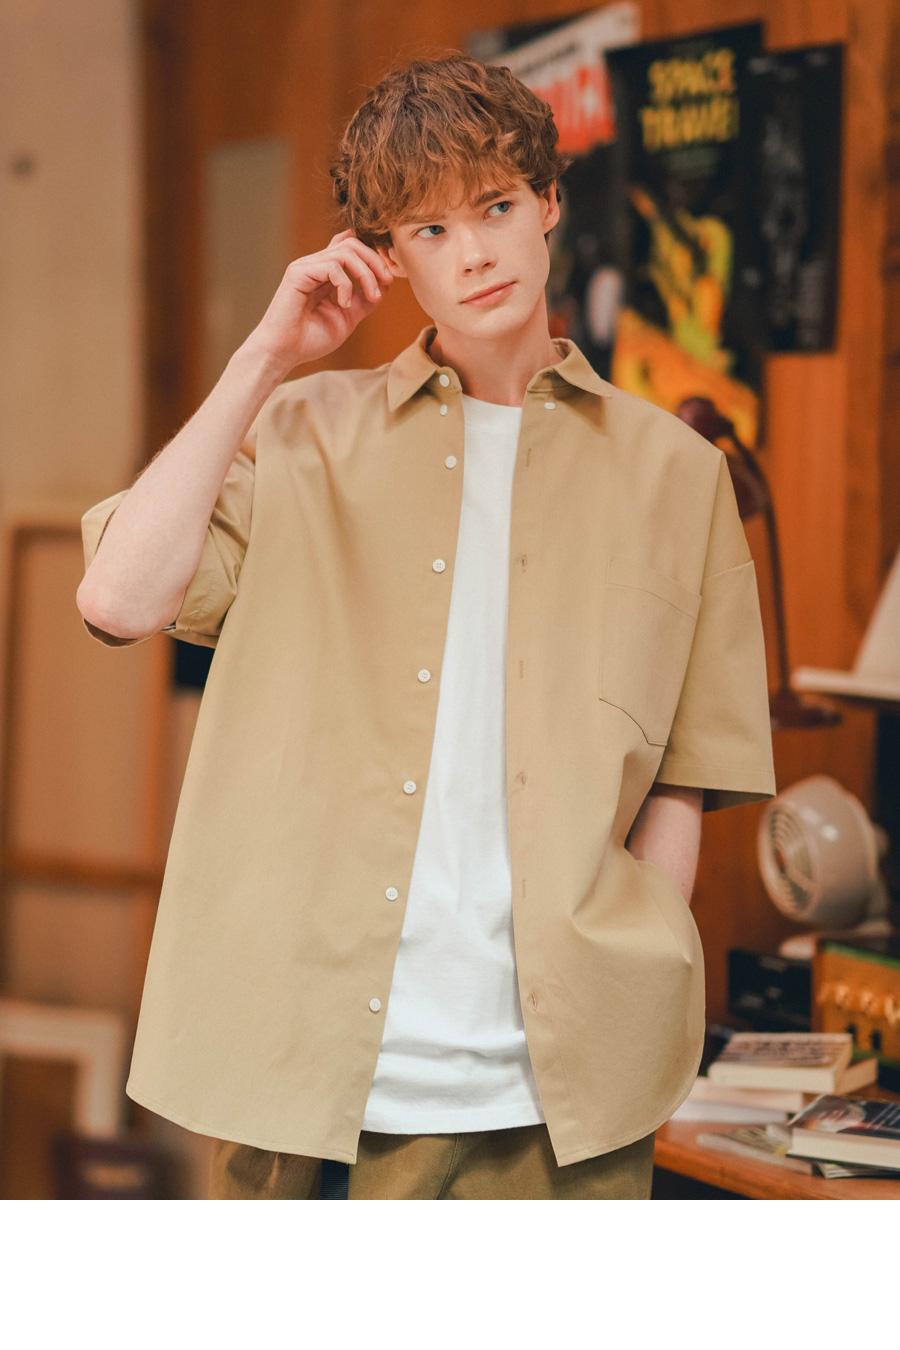 20210331_twn_bedy_shirt_model_je_08.jpg